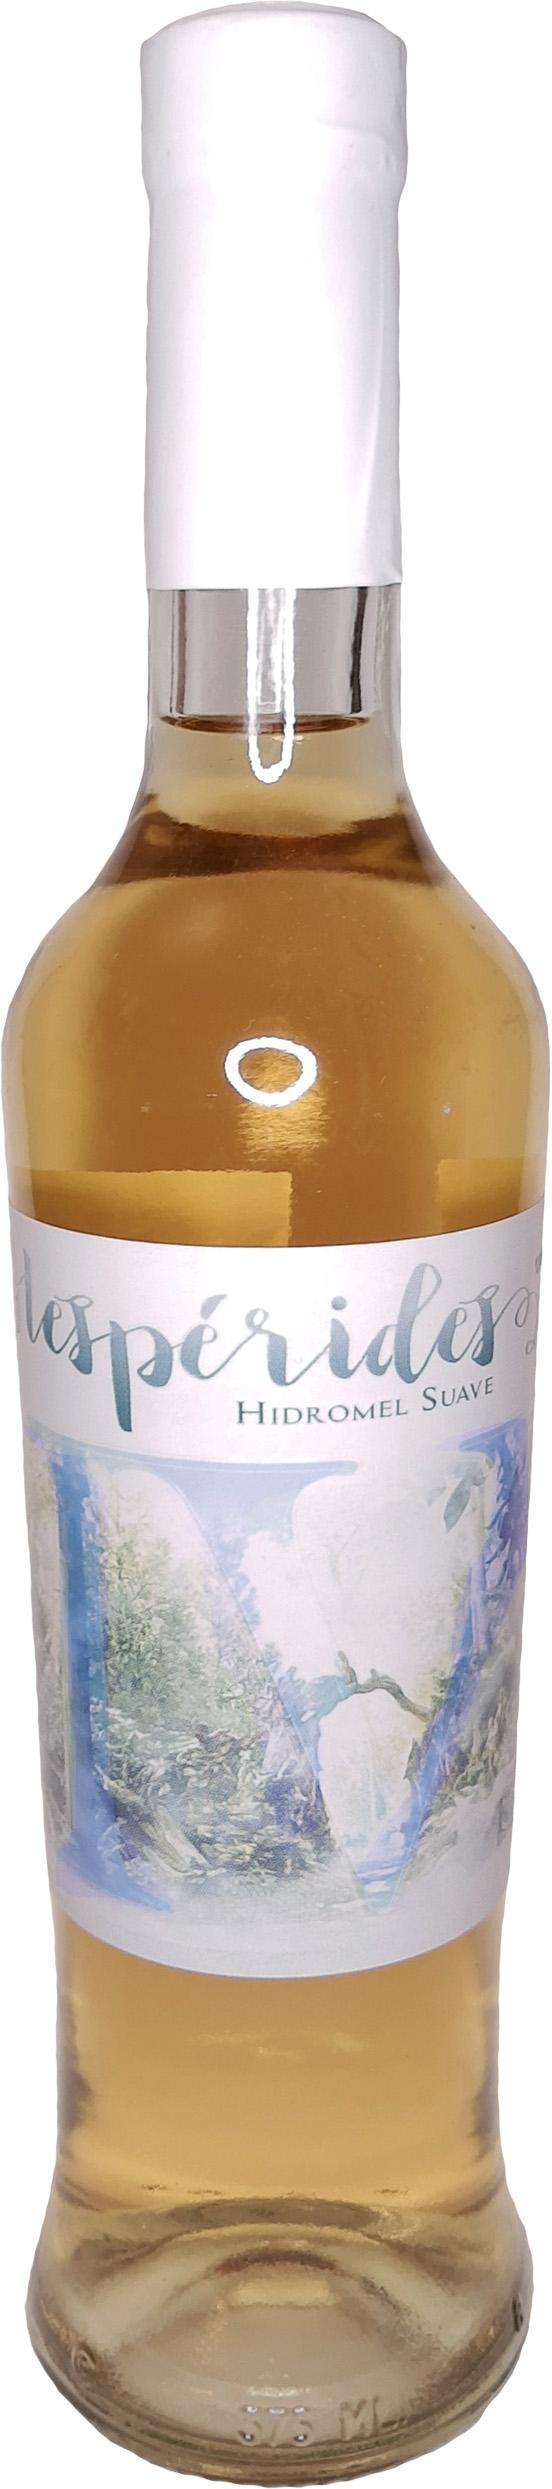 Hidromel Tradicional Hesperides - 375ml